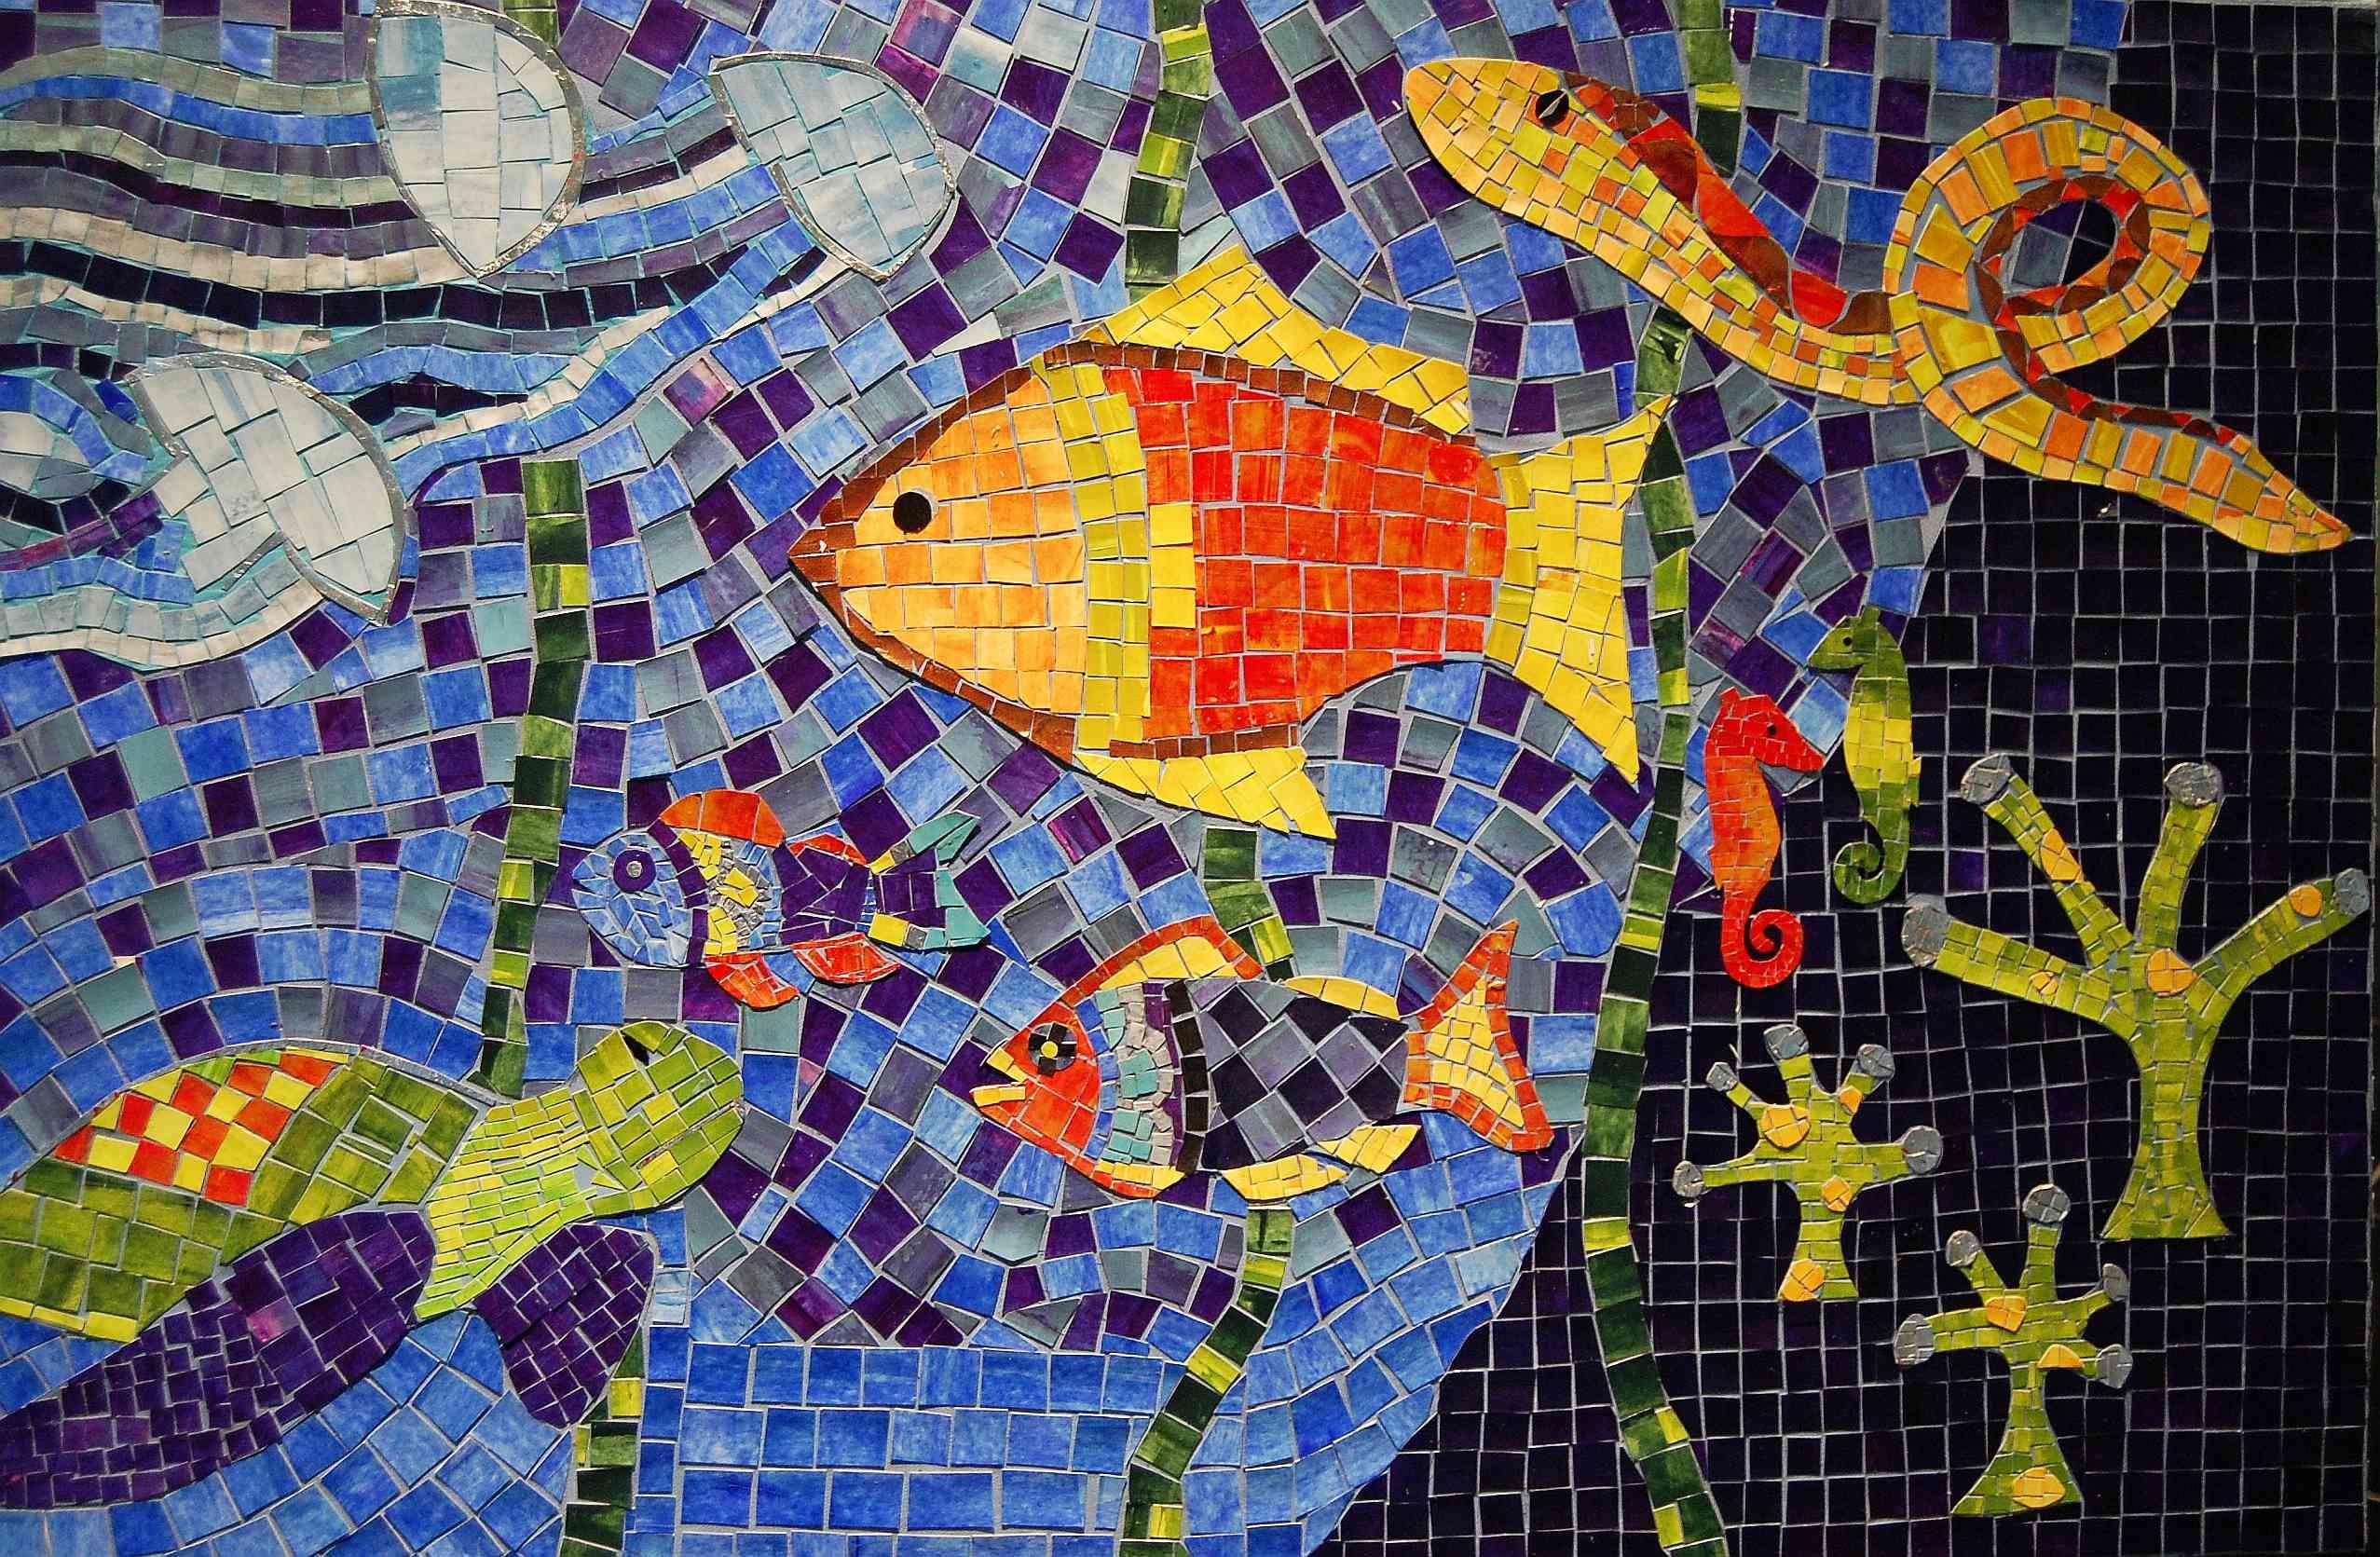 Mosaic #7